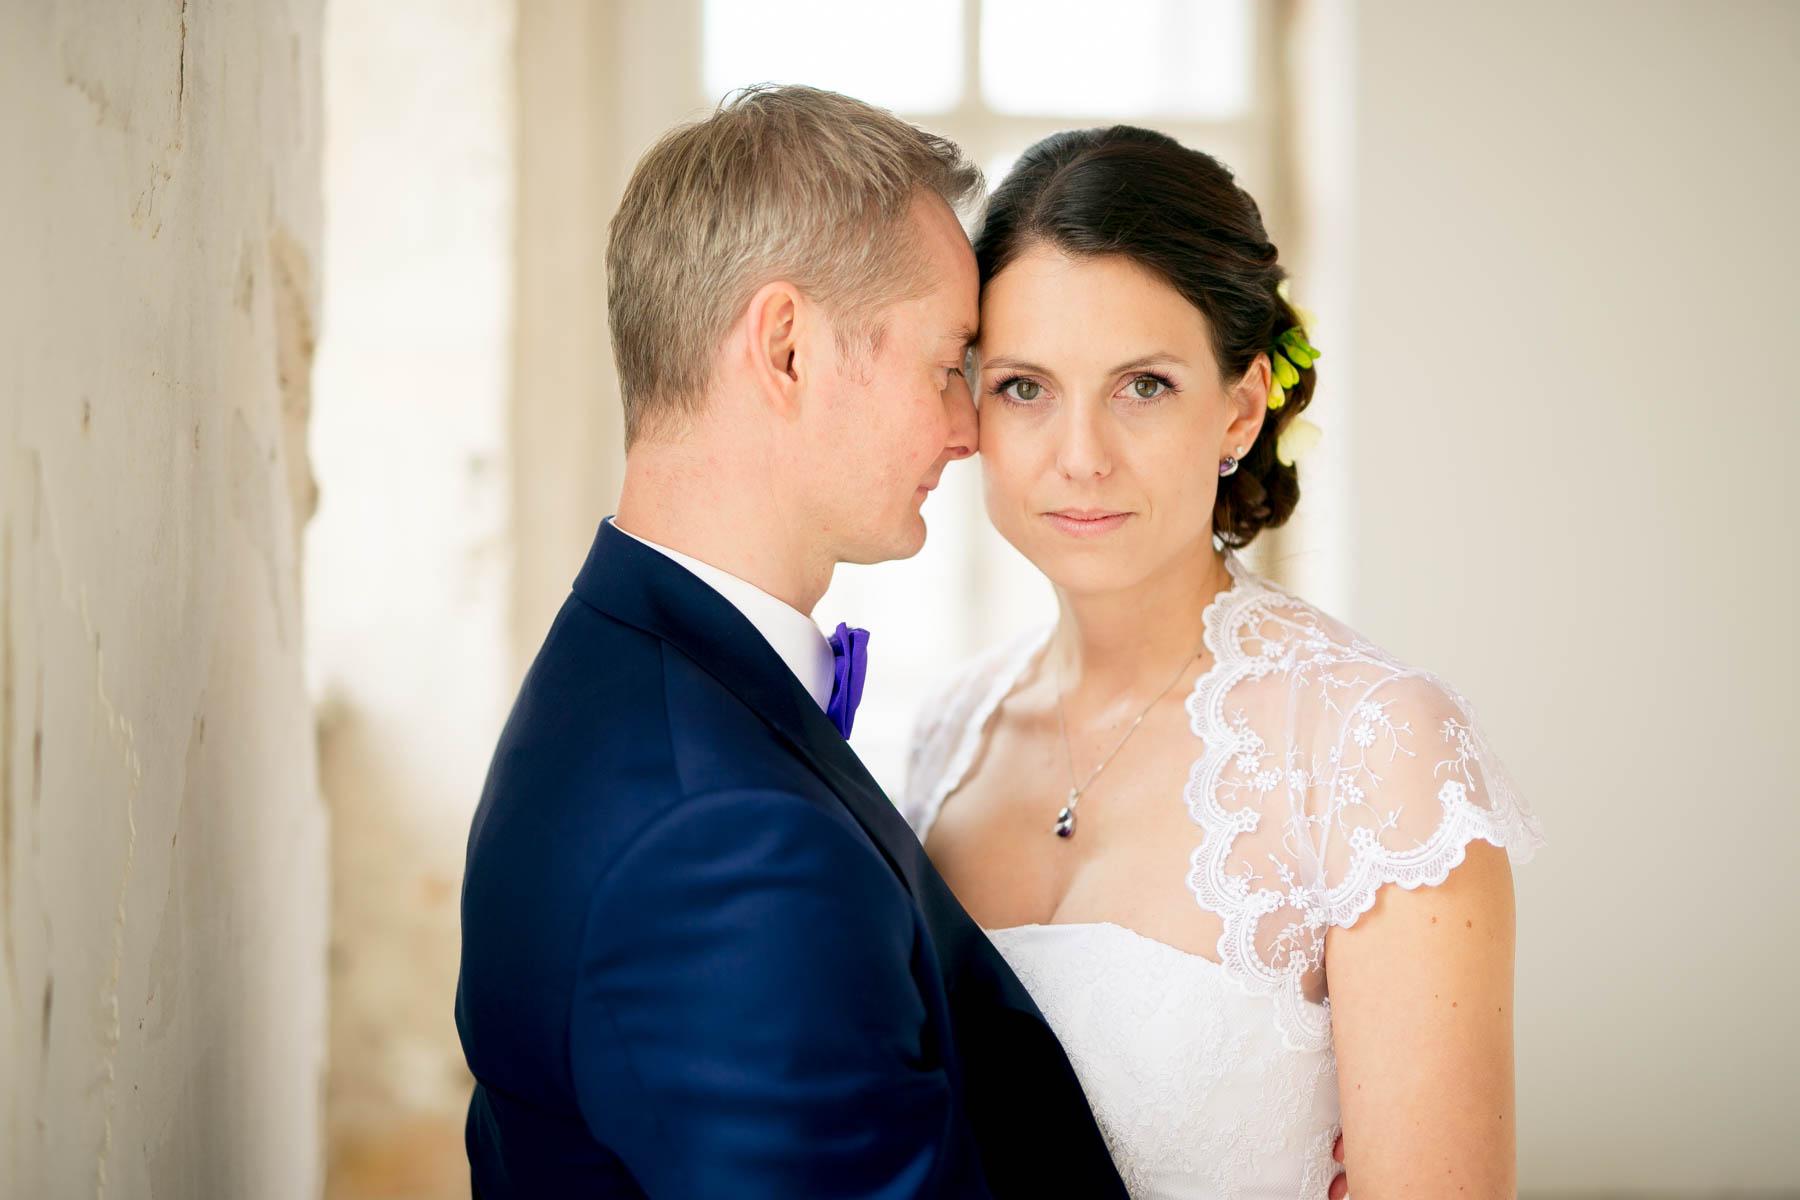 Hochzeit in der Kunztschule Berlin mi tVanessa & Sebastian